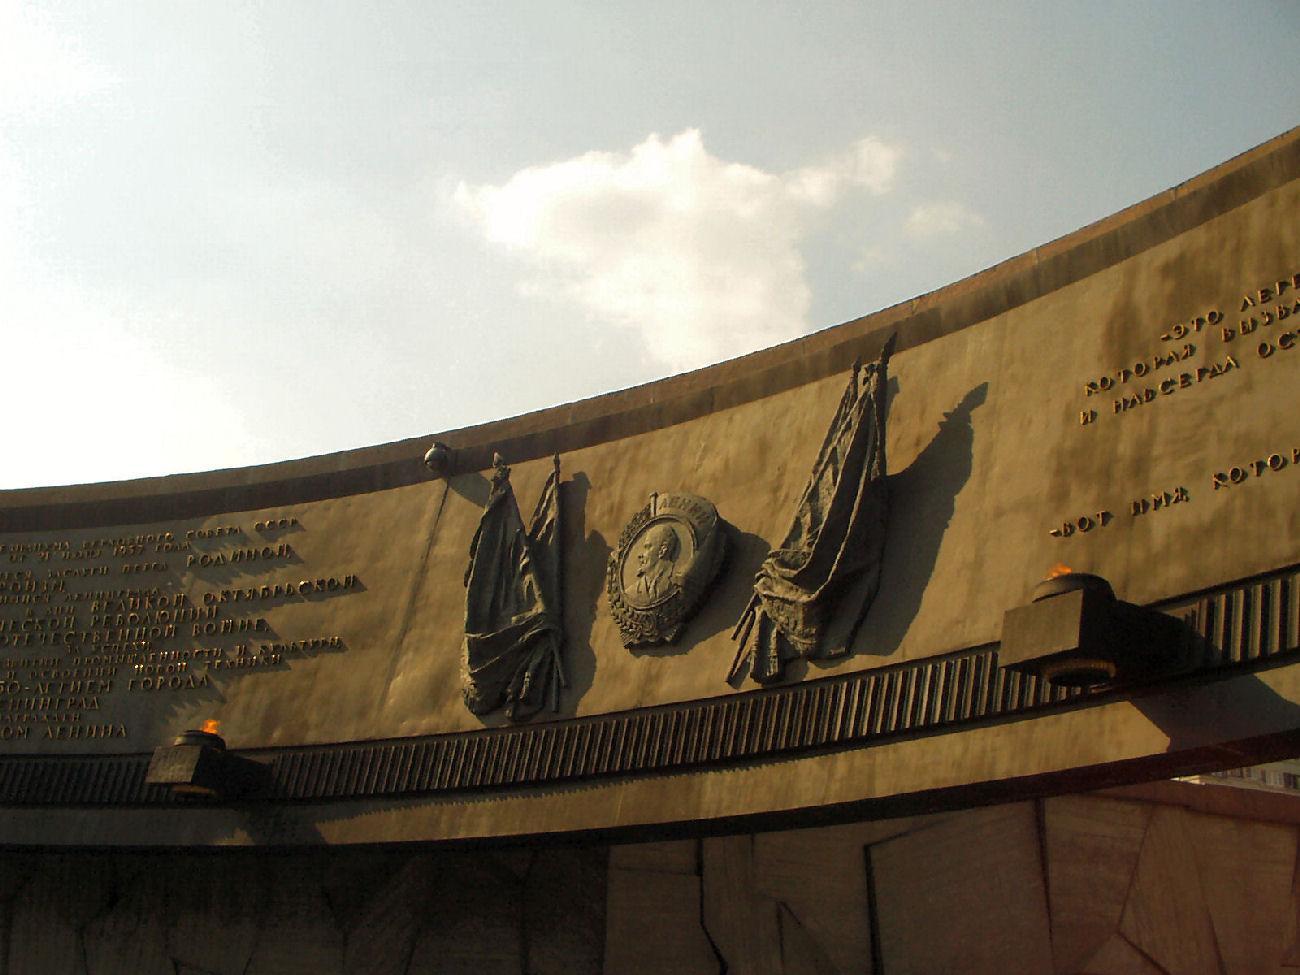 Monument Complex to the Hero City of Leningrad, Saint Petersburg - 2010